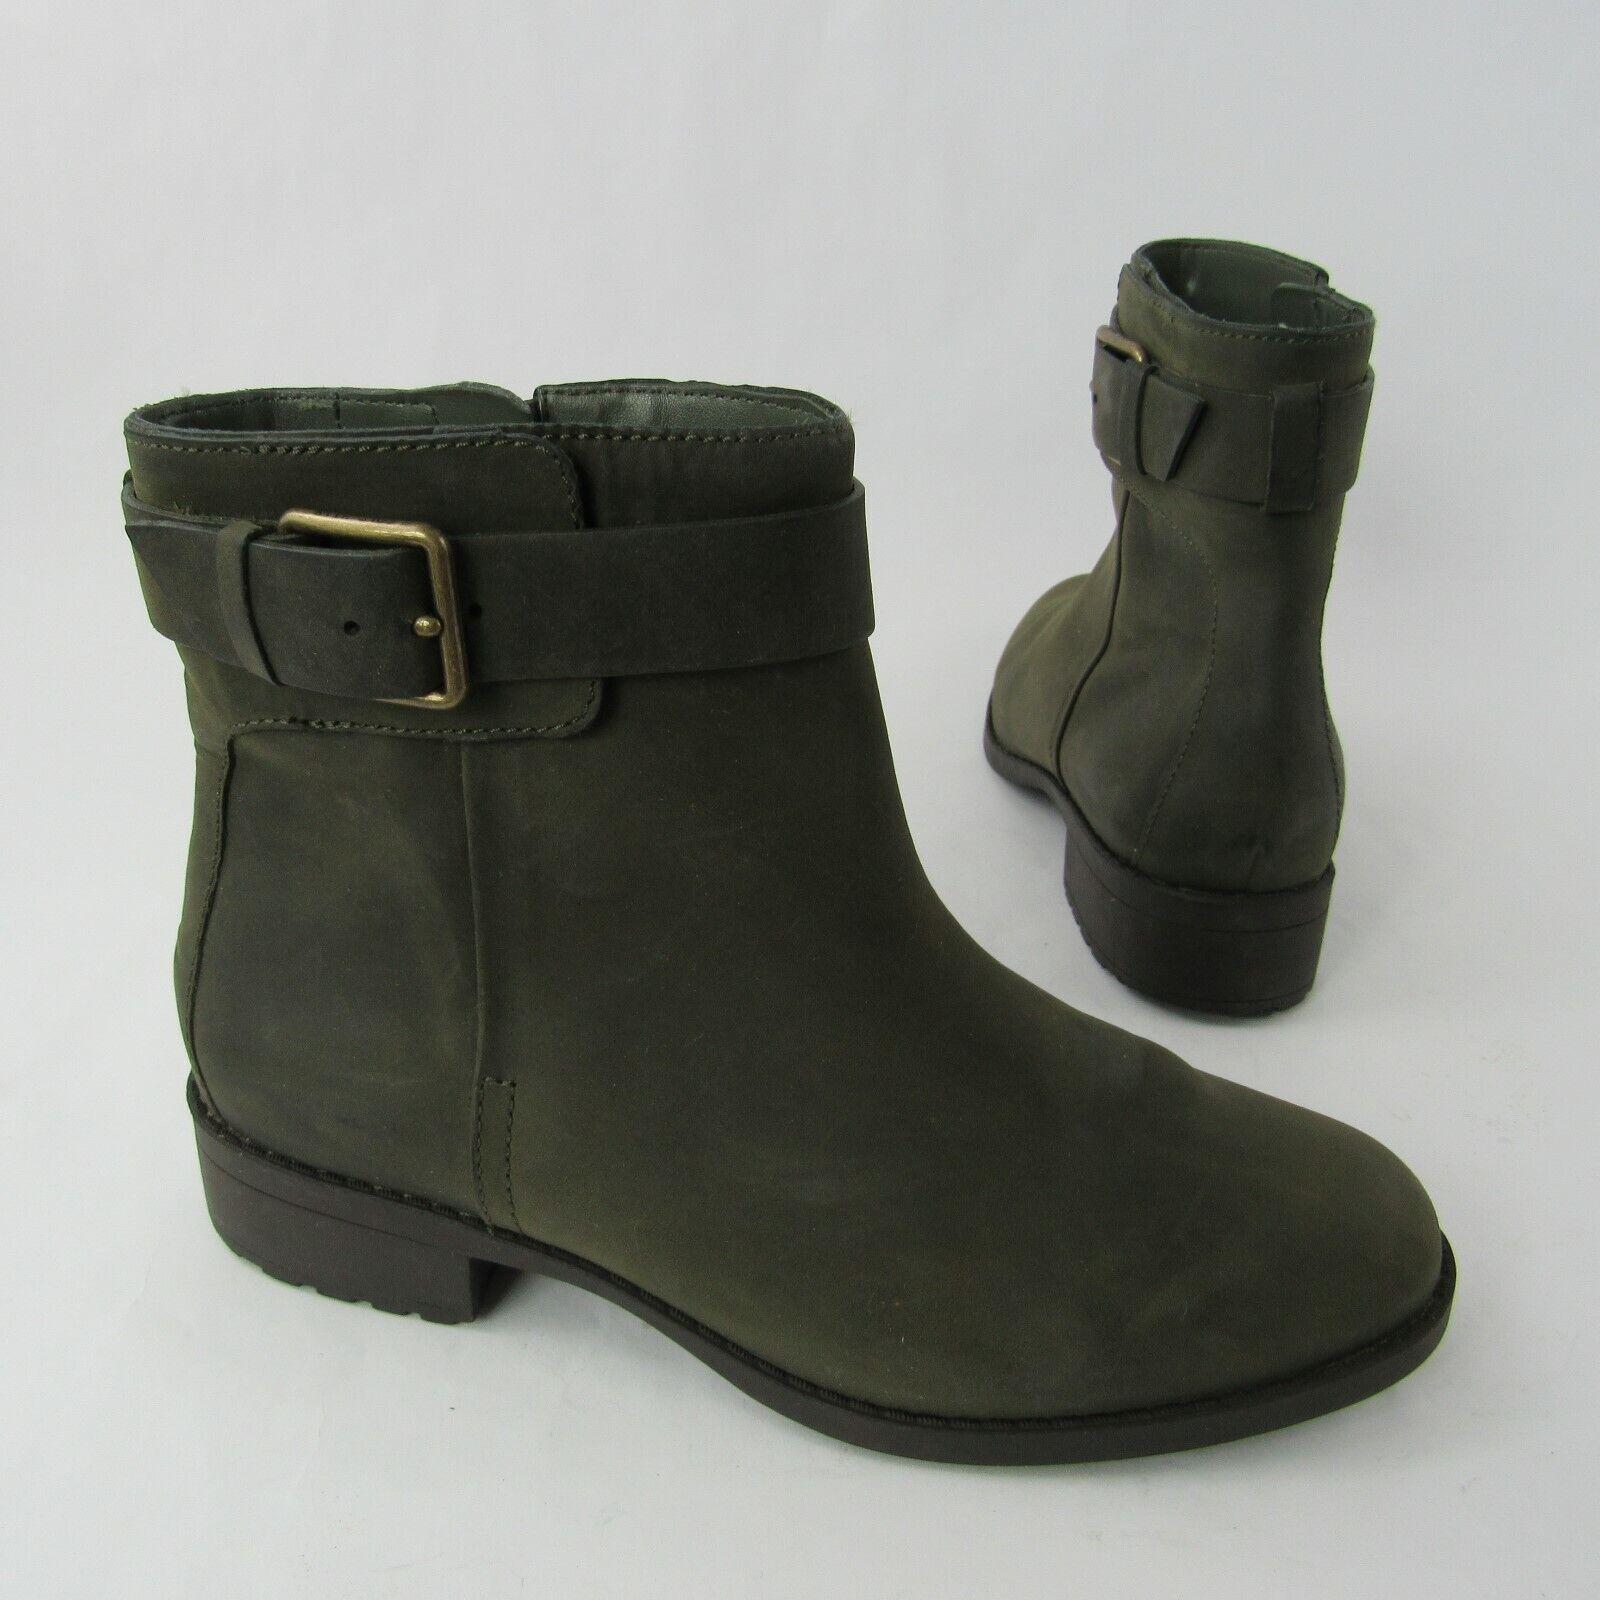 Cole Haan Grand OS Dimensione 6.5 B Ankle  stivali Oiled Leather avvioie Zip Olive verde  rivenditore di fitness